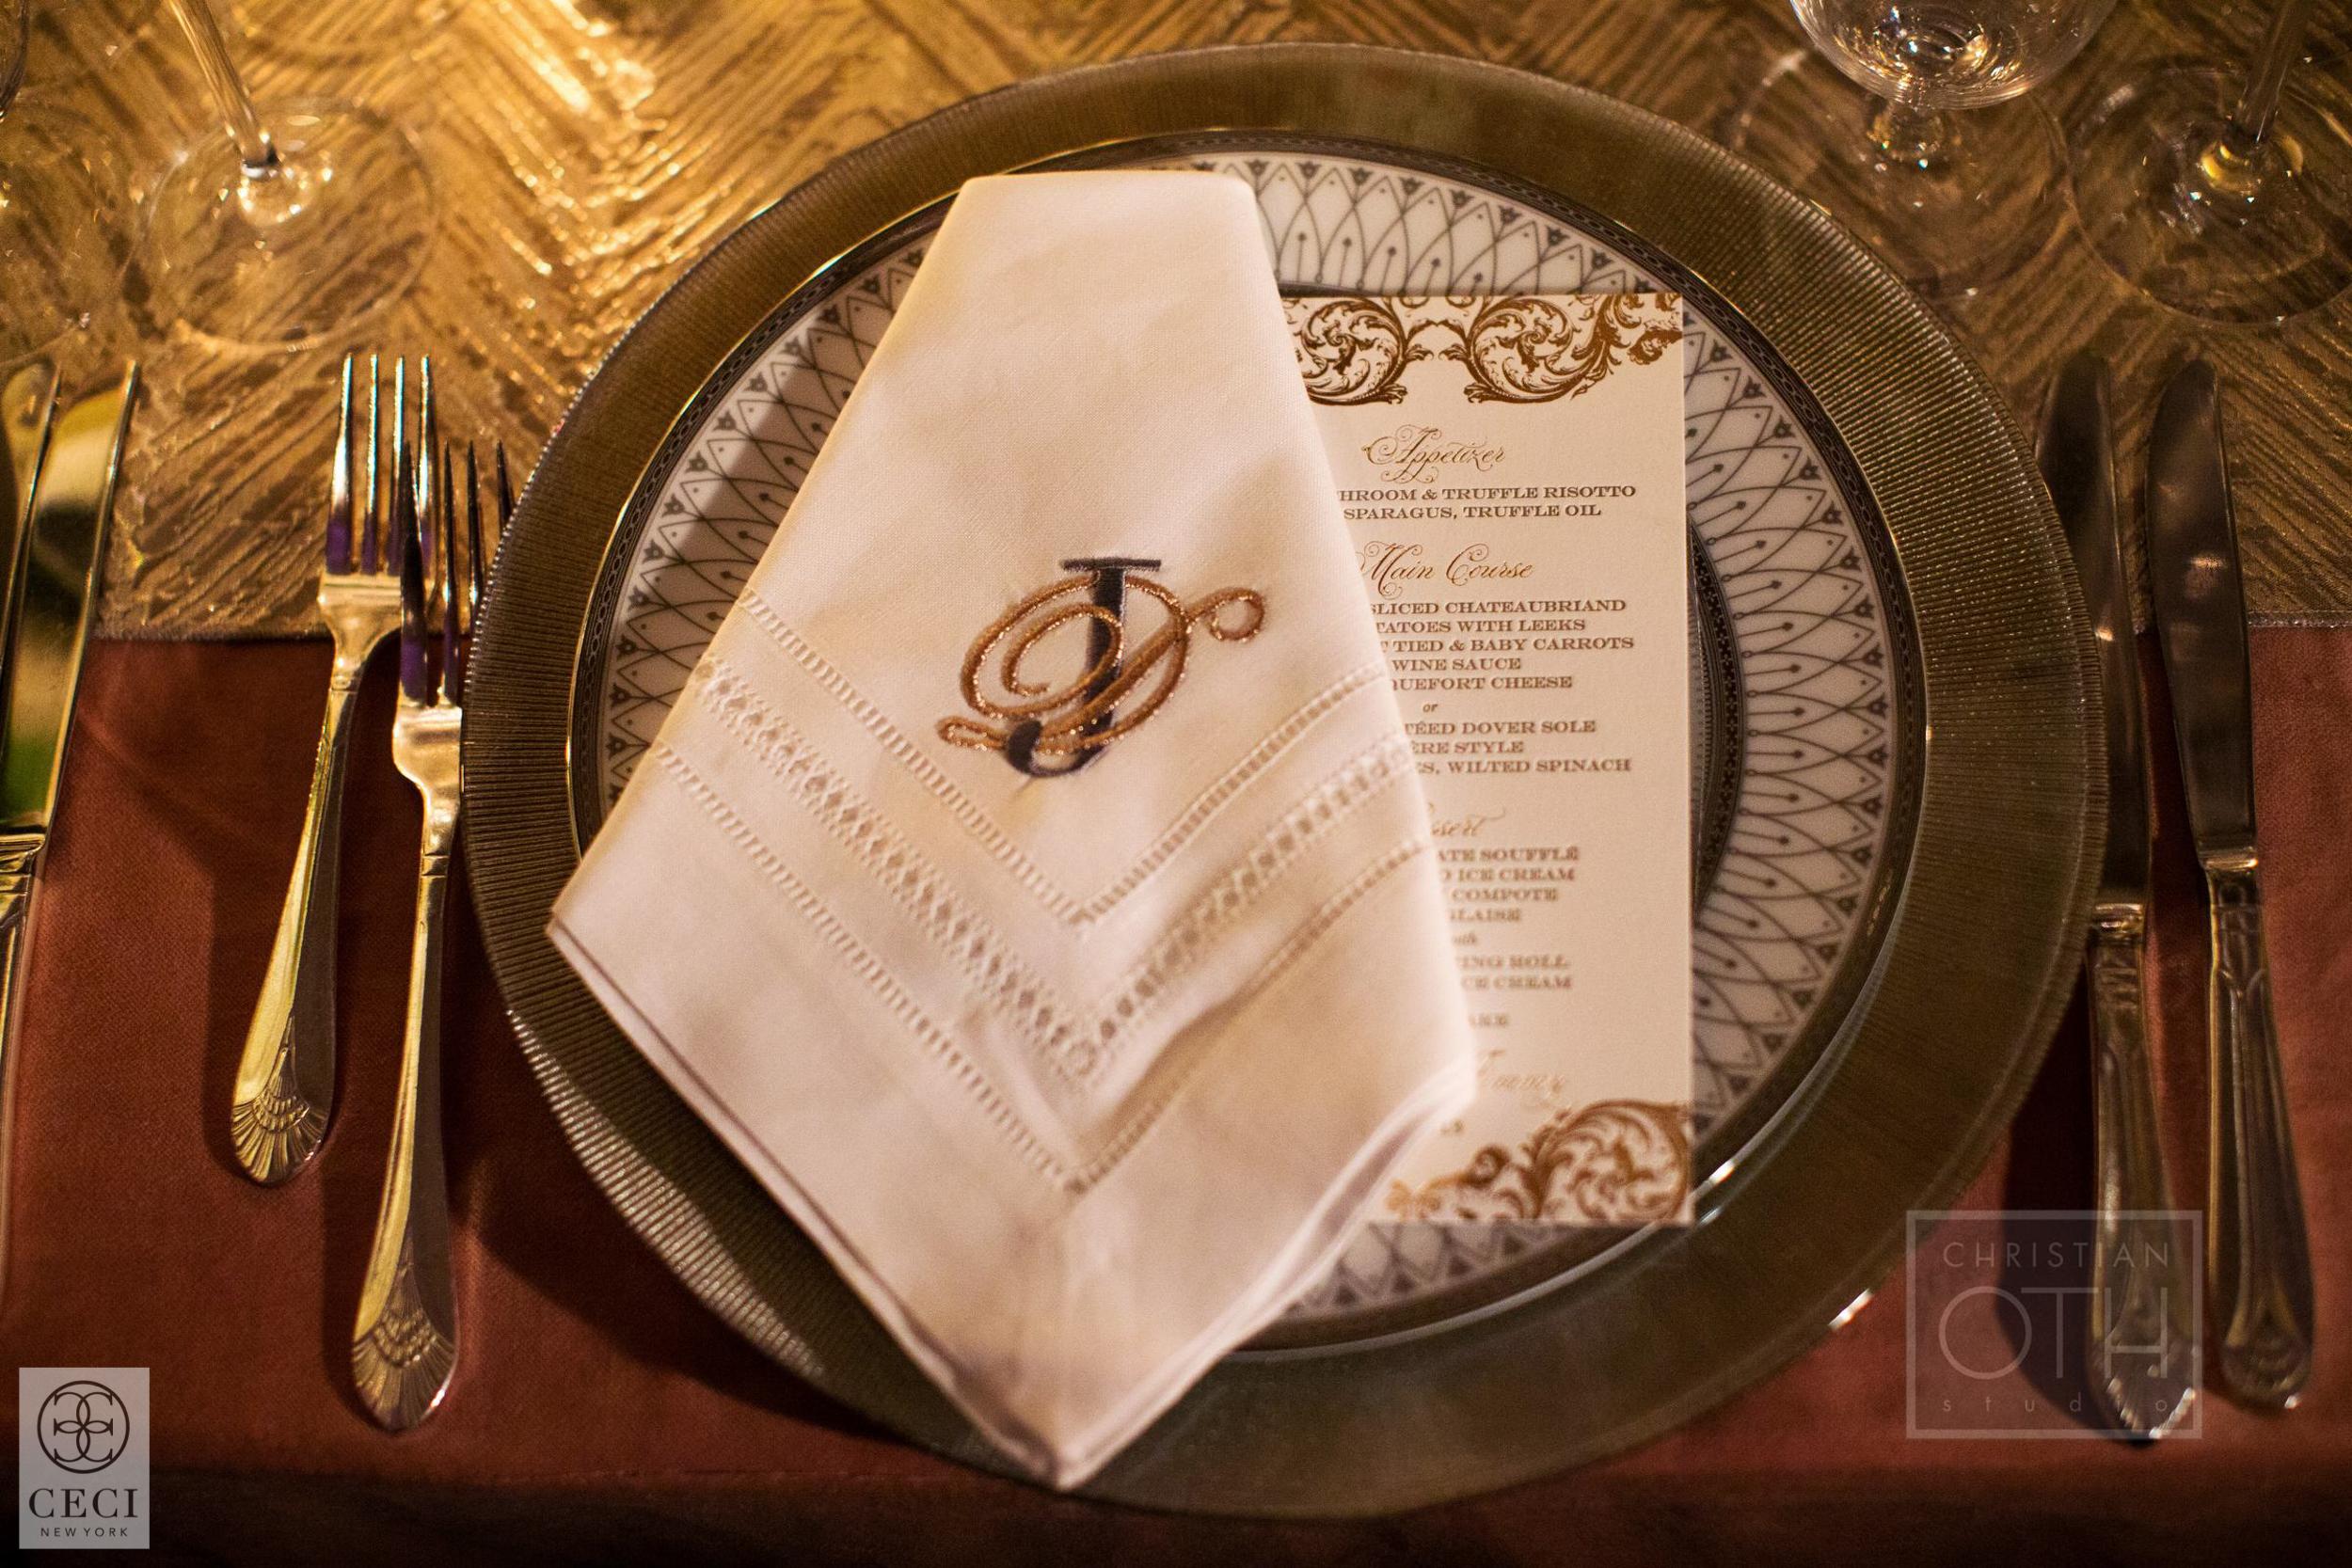 Ceci_New_York_Christian_Oth_CeciStyle_Pierre_New_York_City_Wedding_Luxury_Custom_Invitations_Personalized_Rose_Gold_Blush_Bride_-7.jpg